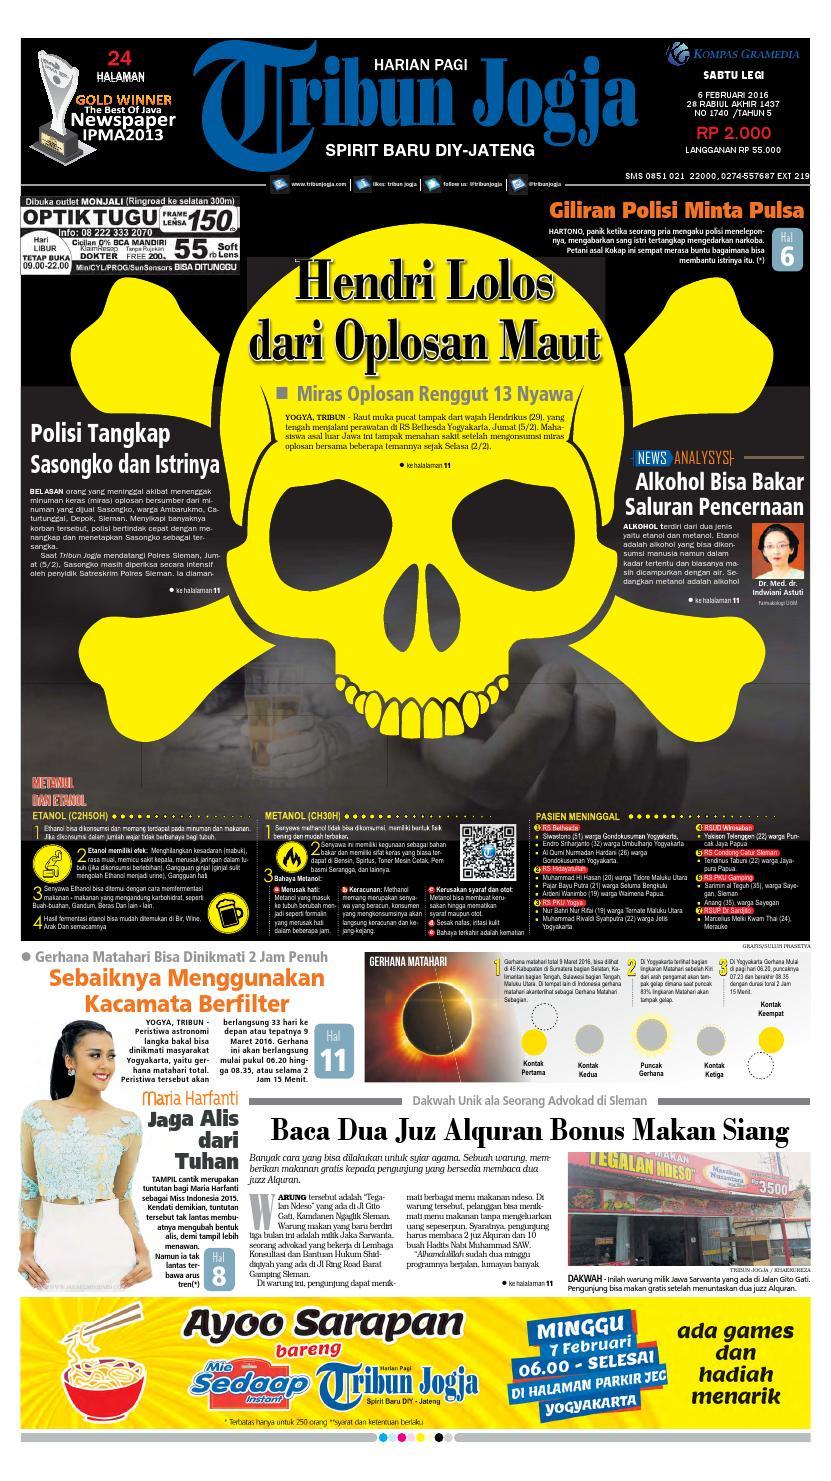 Tribunjogja 26 06 2015 By Tribun Jogja Issuu Produk Ukm Bumn Shifudo Bakso Ikan 500g Free Ongkir Depok Ampamp Jakarta 02 2016